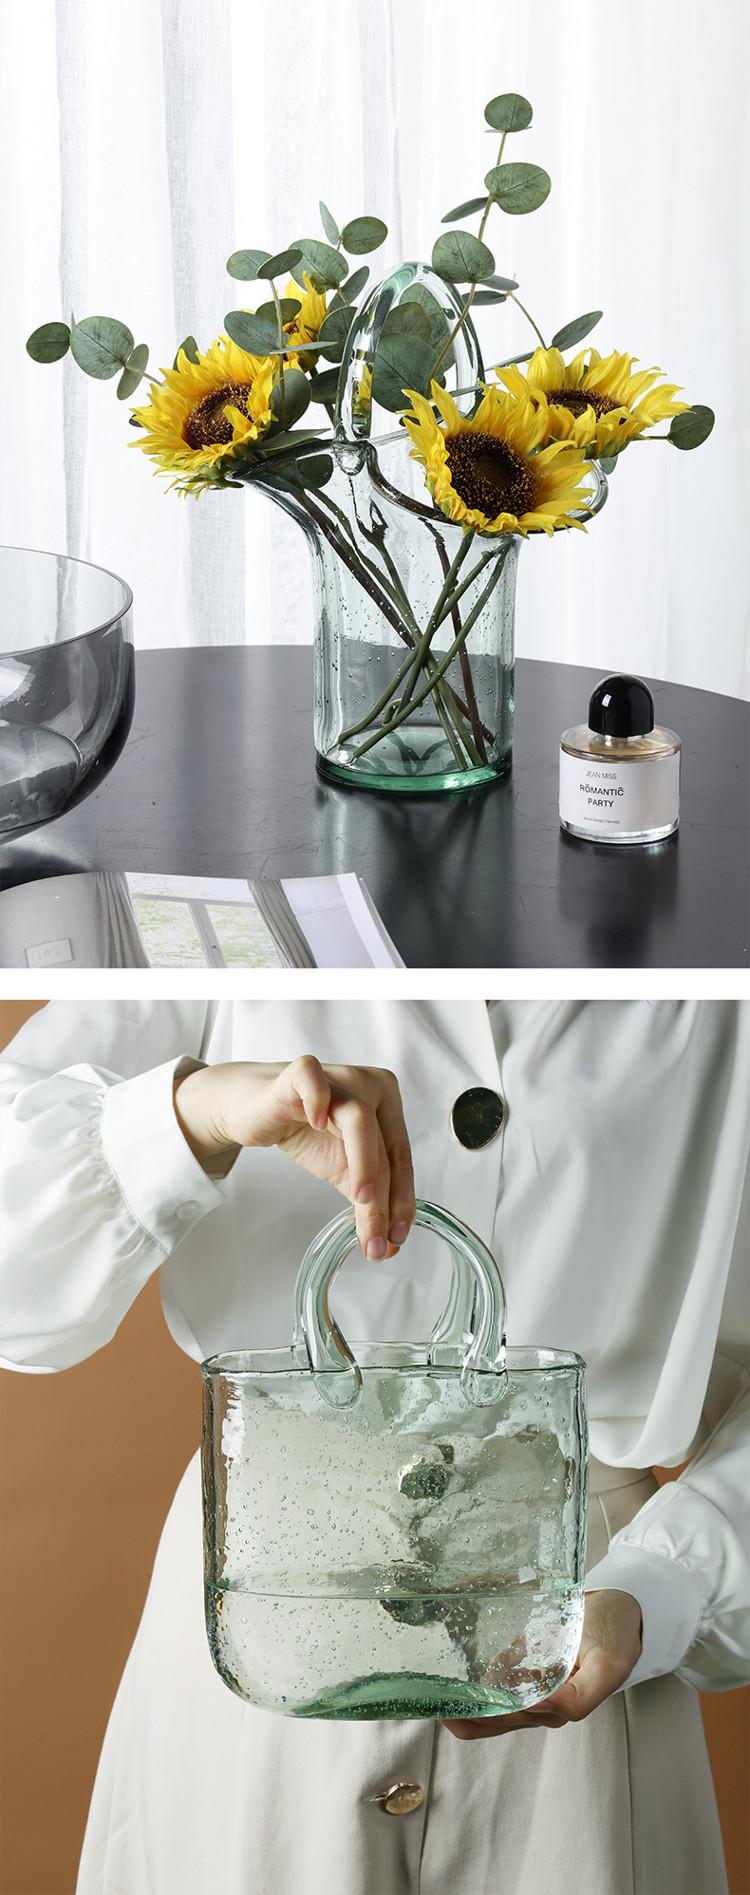 1JC21019 Glass Purse Shaped Vase Sale (17)